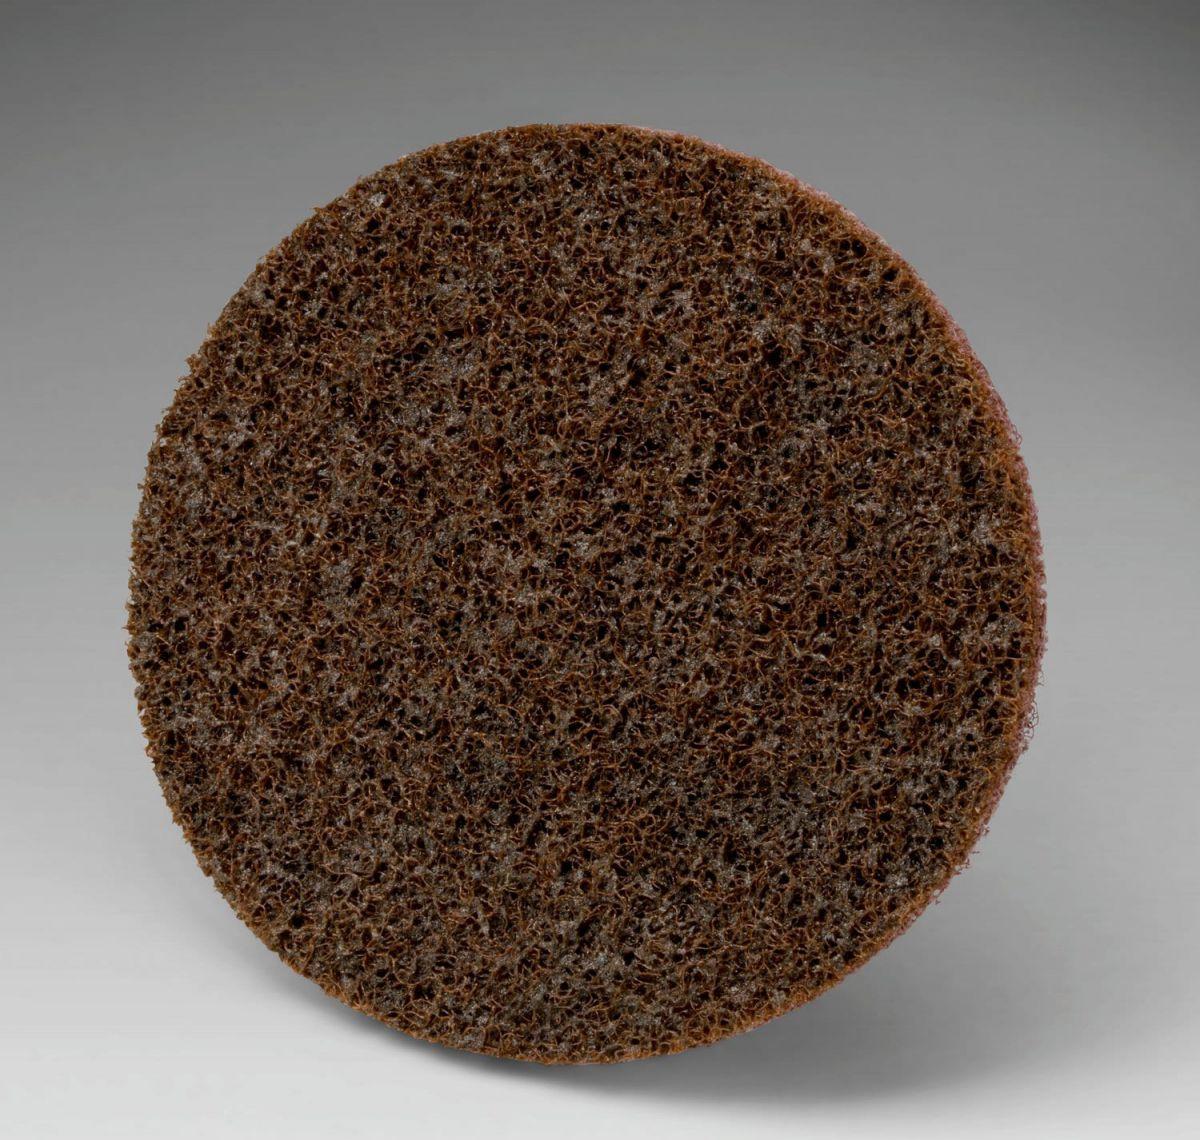 3m scotchbrite roloc surface conditioning schijf sldr zwart 76 mm a crs super duty